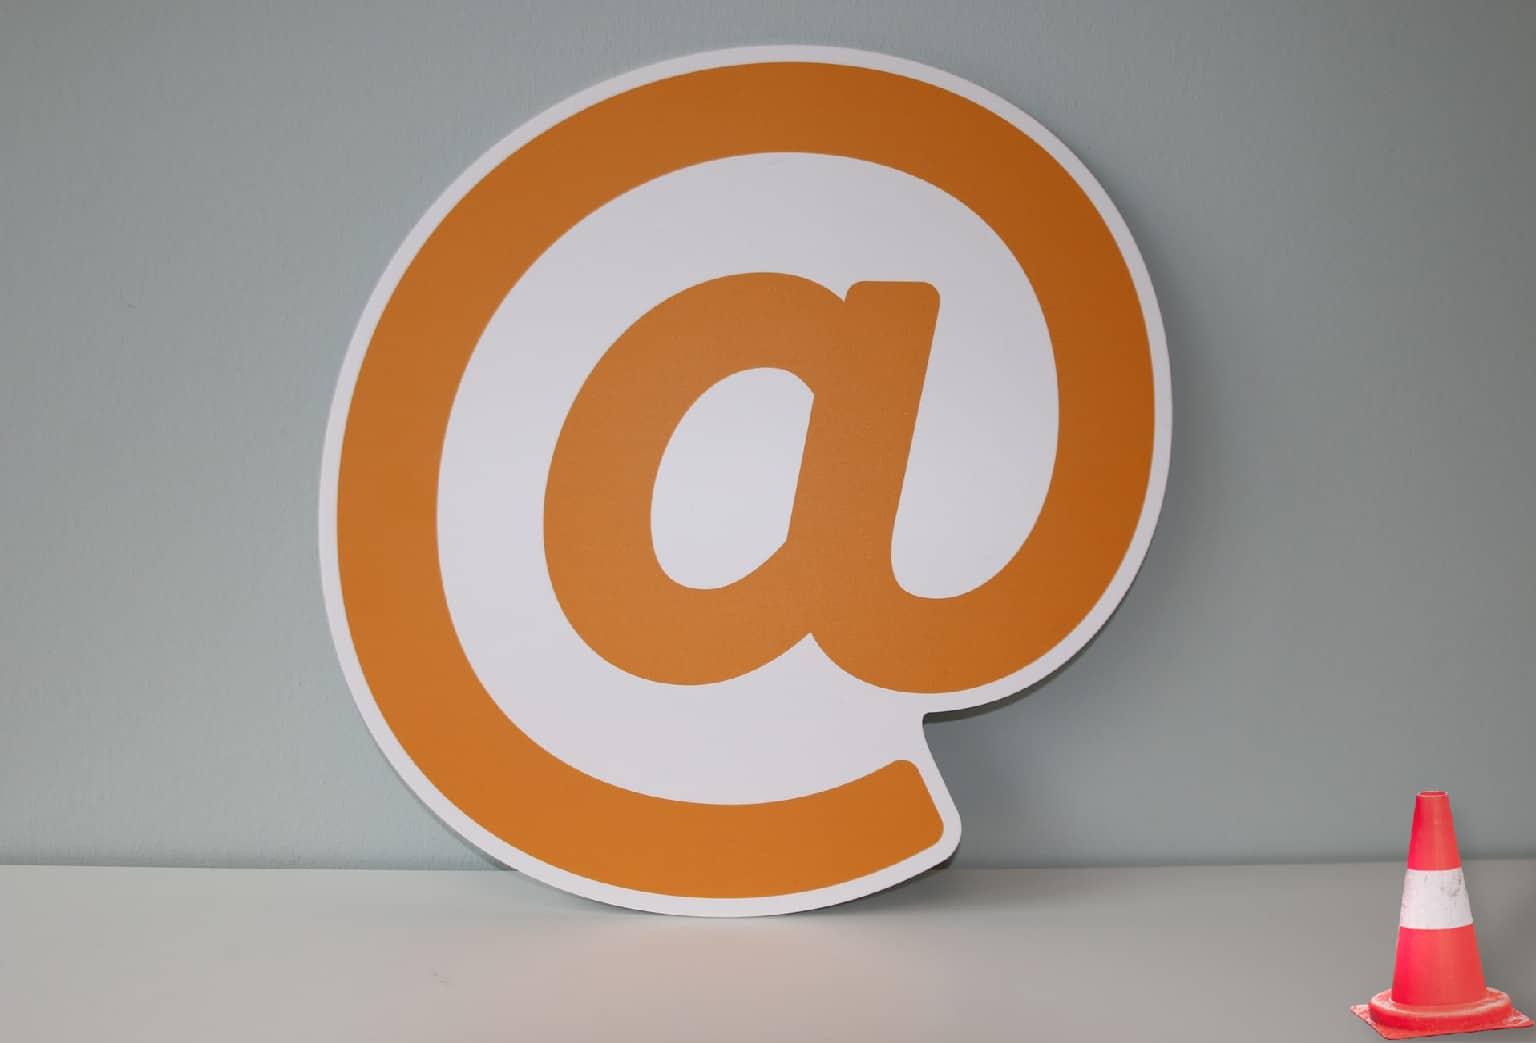 controle email salaries quels sont mes droits